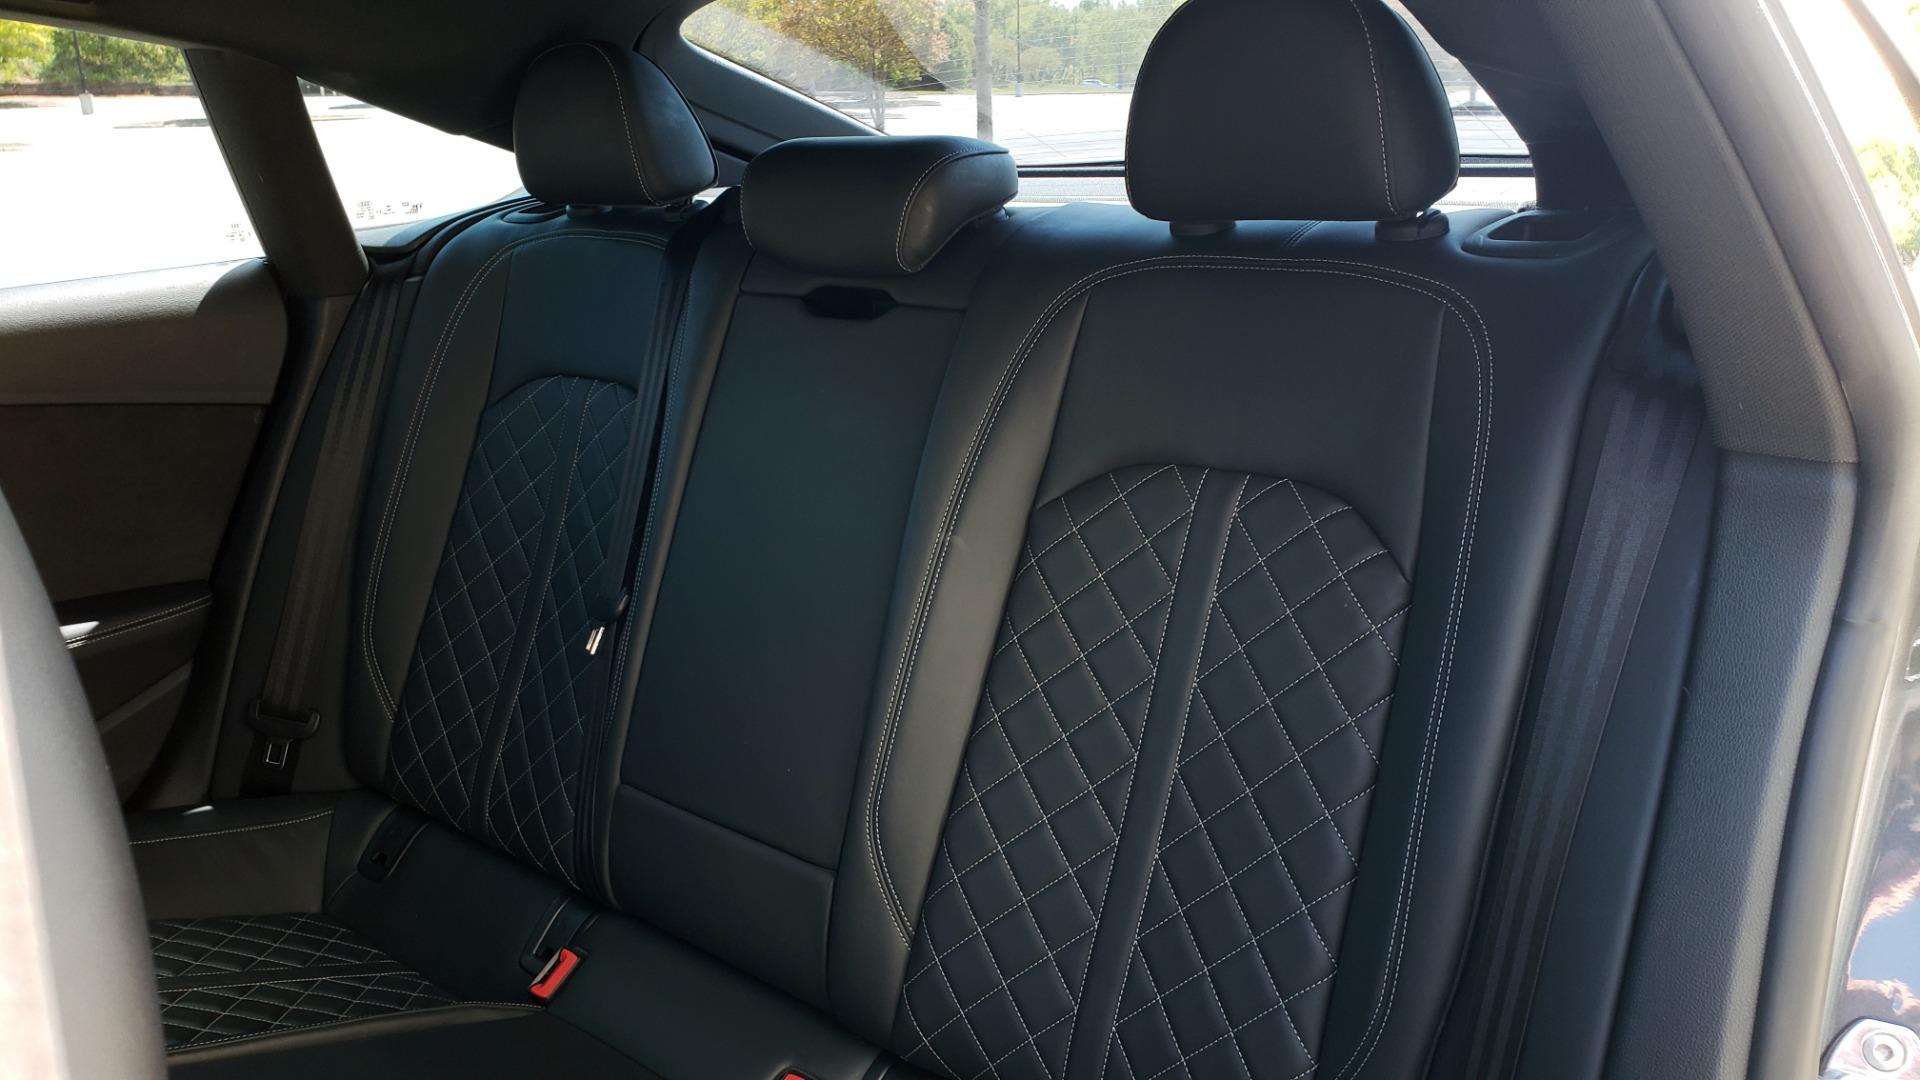 Used 2018 Audi S5 SPORTBACK PRESTIGE S-SPORT / NAV / SUNROOF / HUD / B&O SND / REARVIEW for sale $48,995 at Formula Imports in Charlotte NC 28227 53